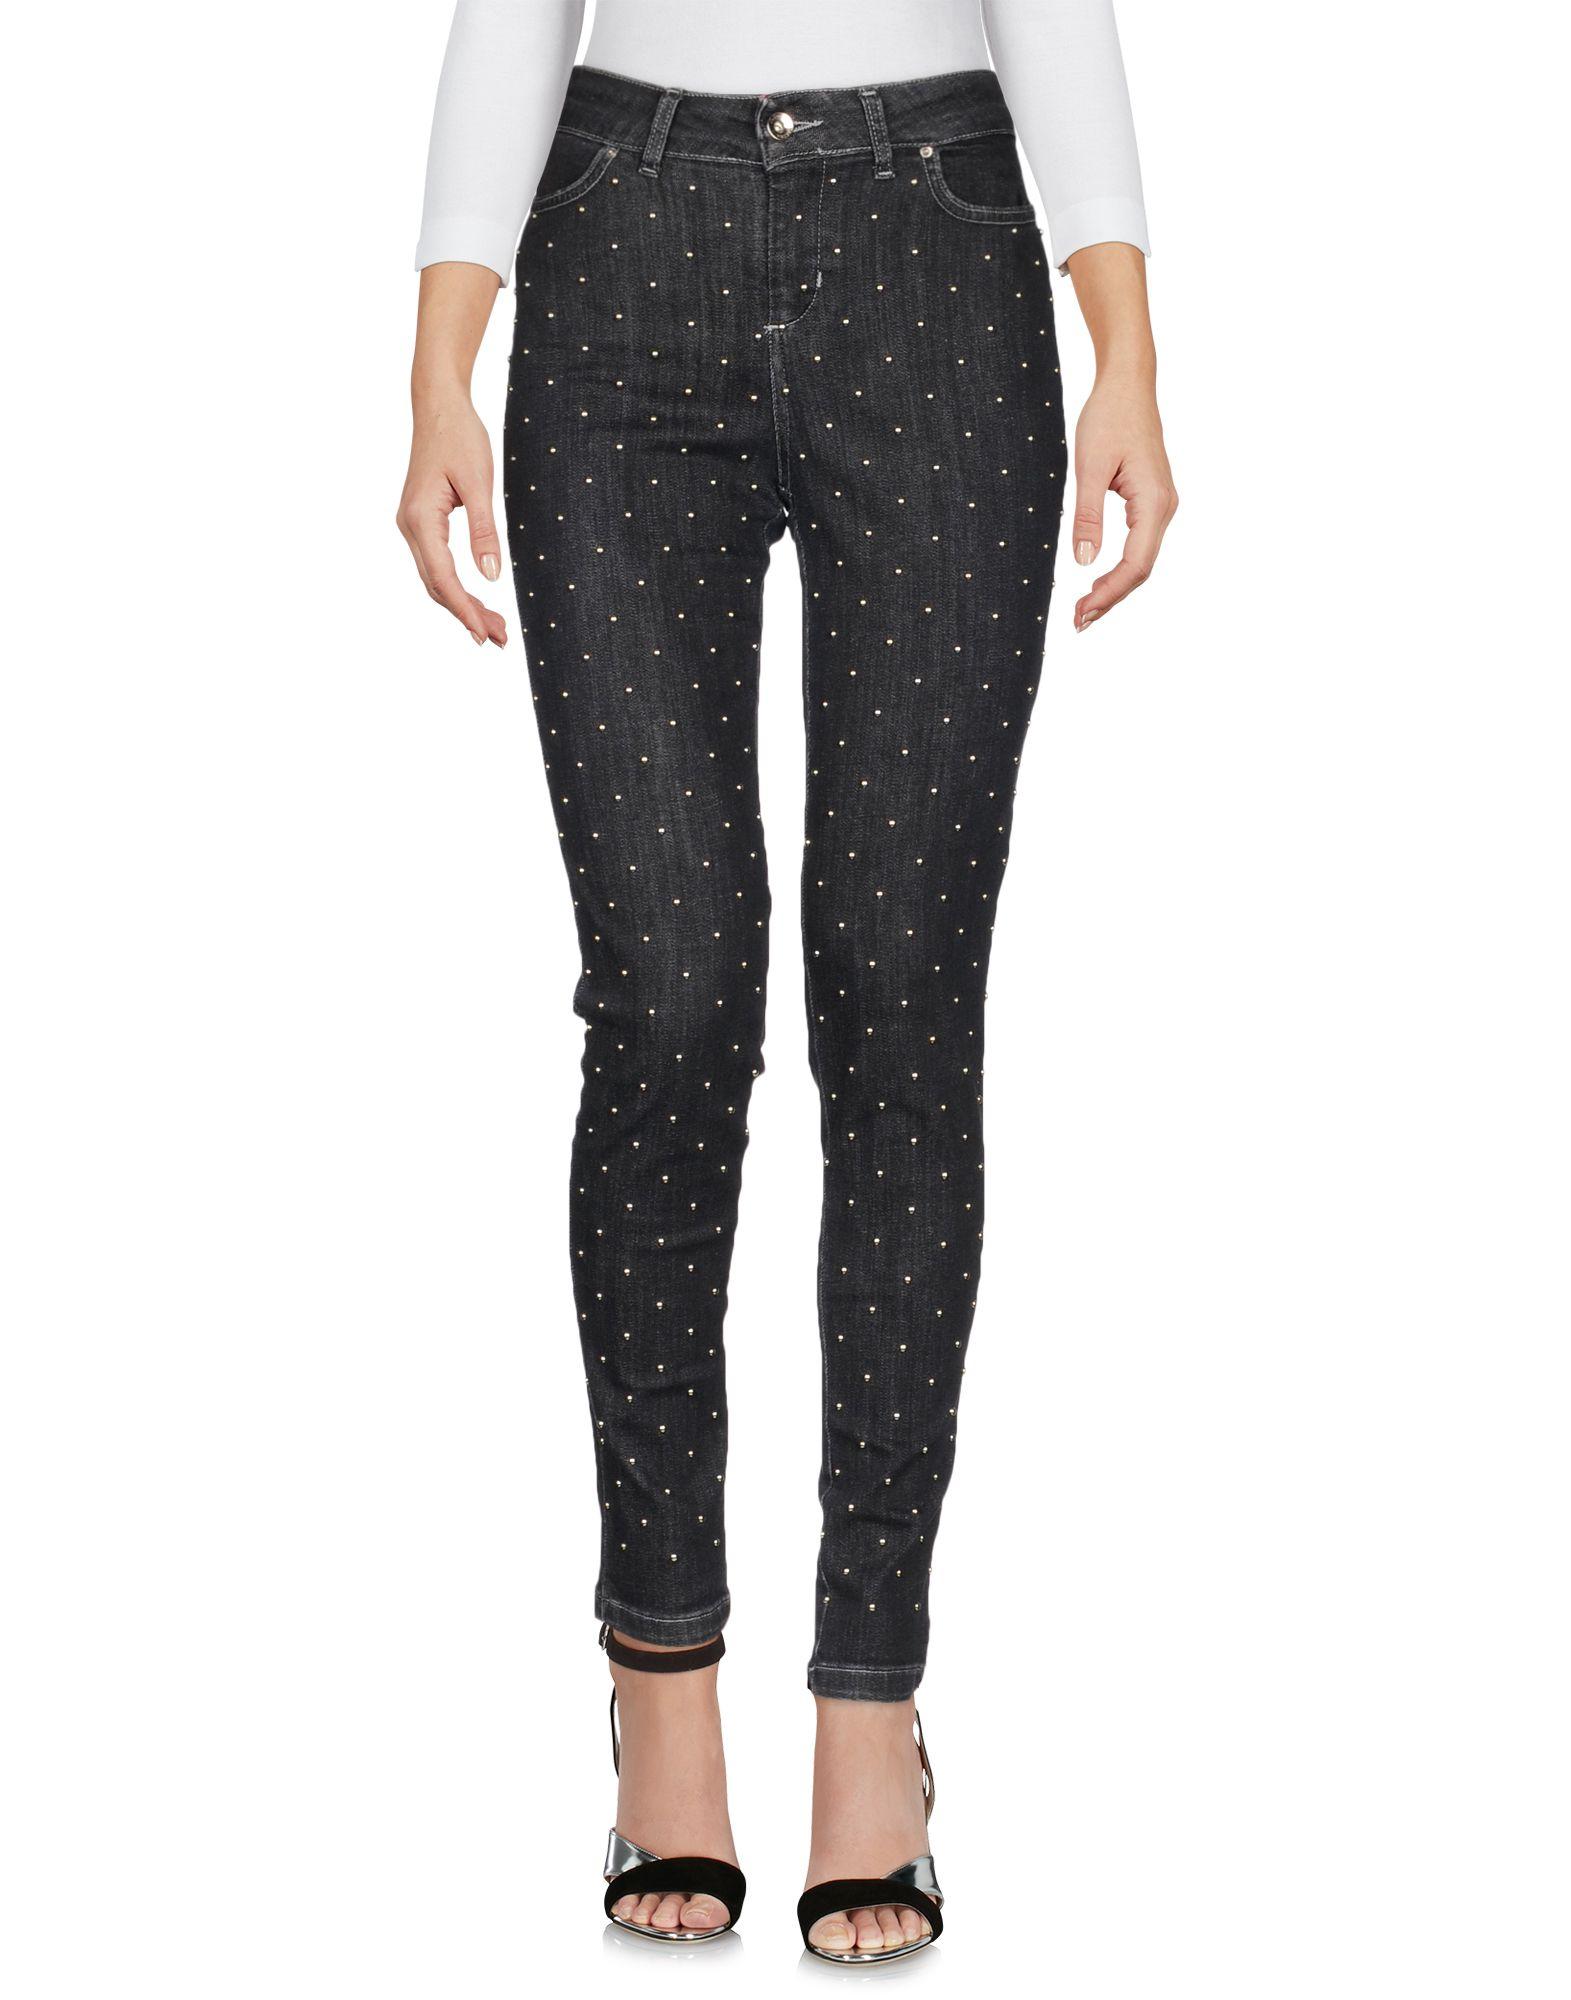 Online Acquista Su Gretha Pantaloni Yoox Donna Jeans Milano qxPFPwvS 99d7ac09ceb